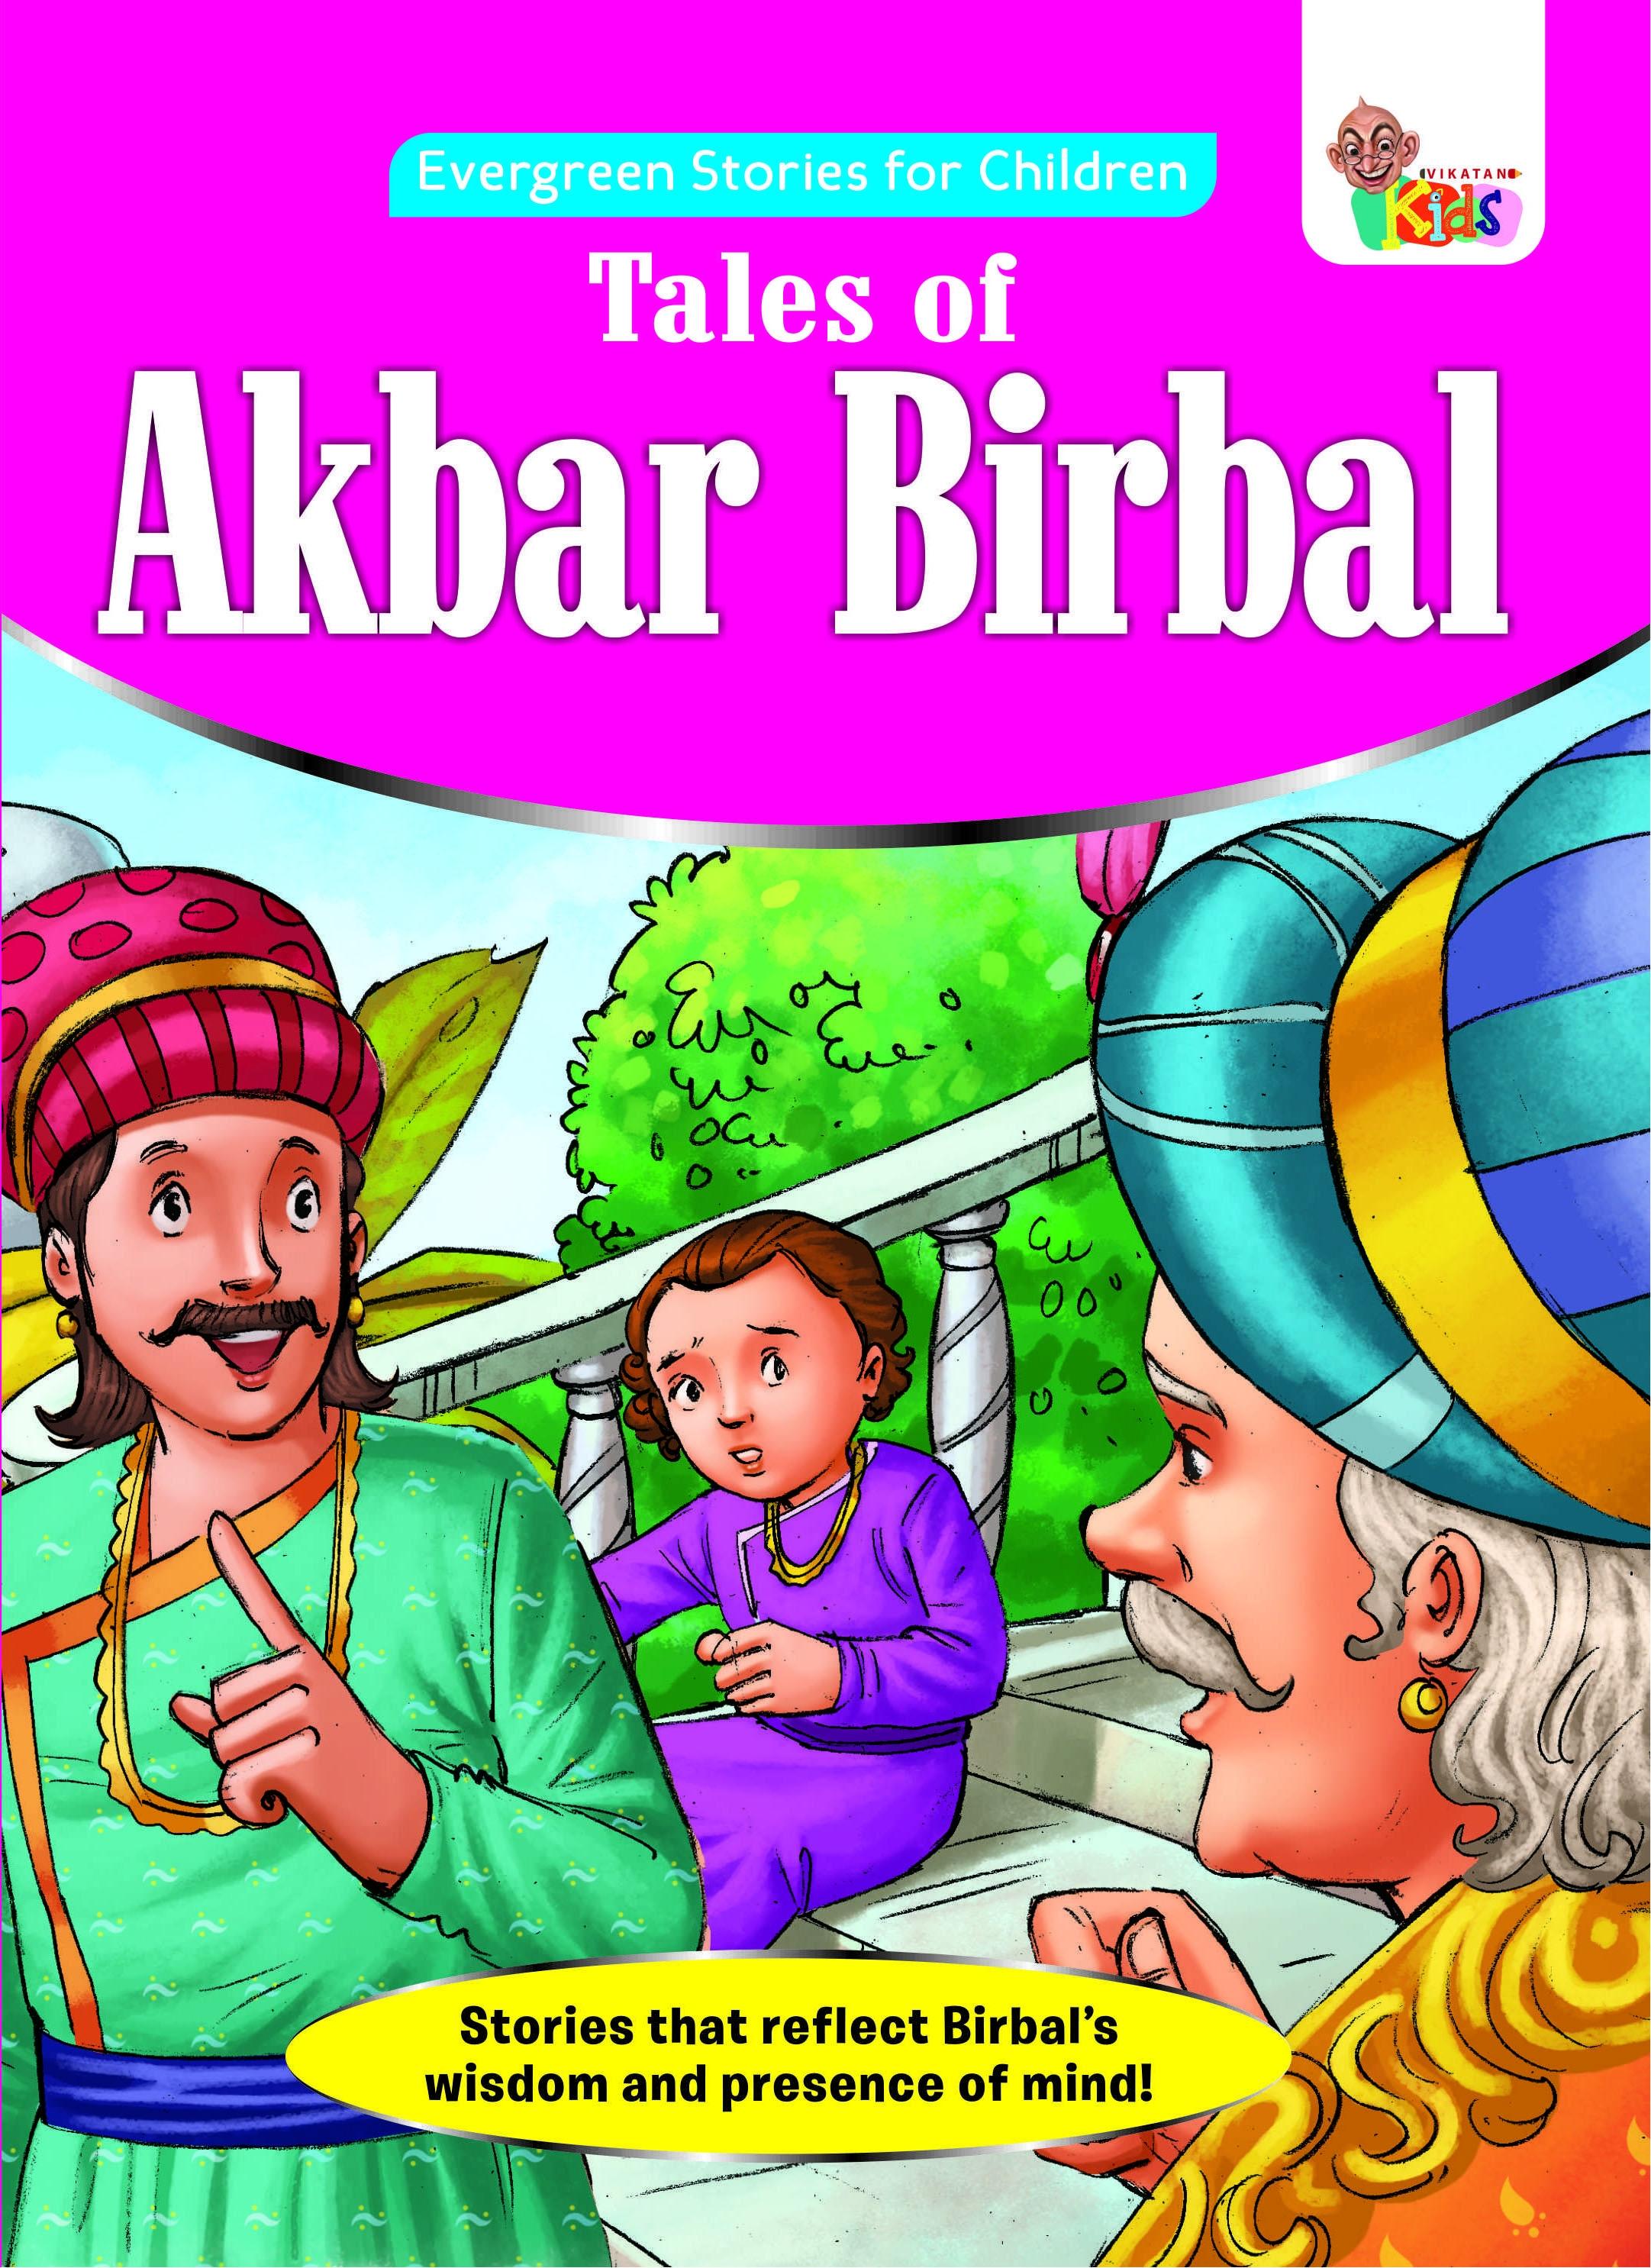 Tales of Akbar Birbal